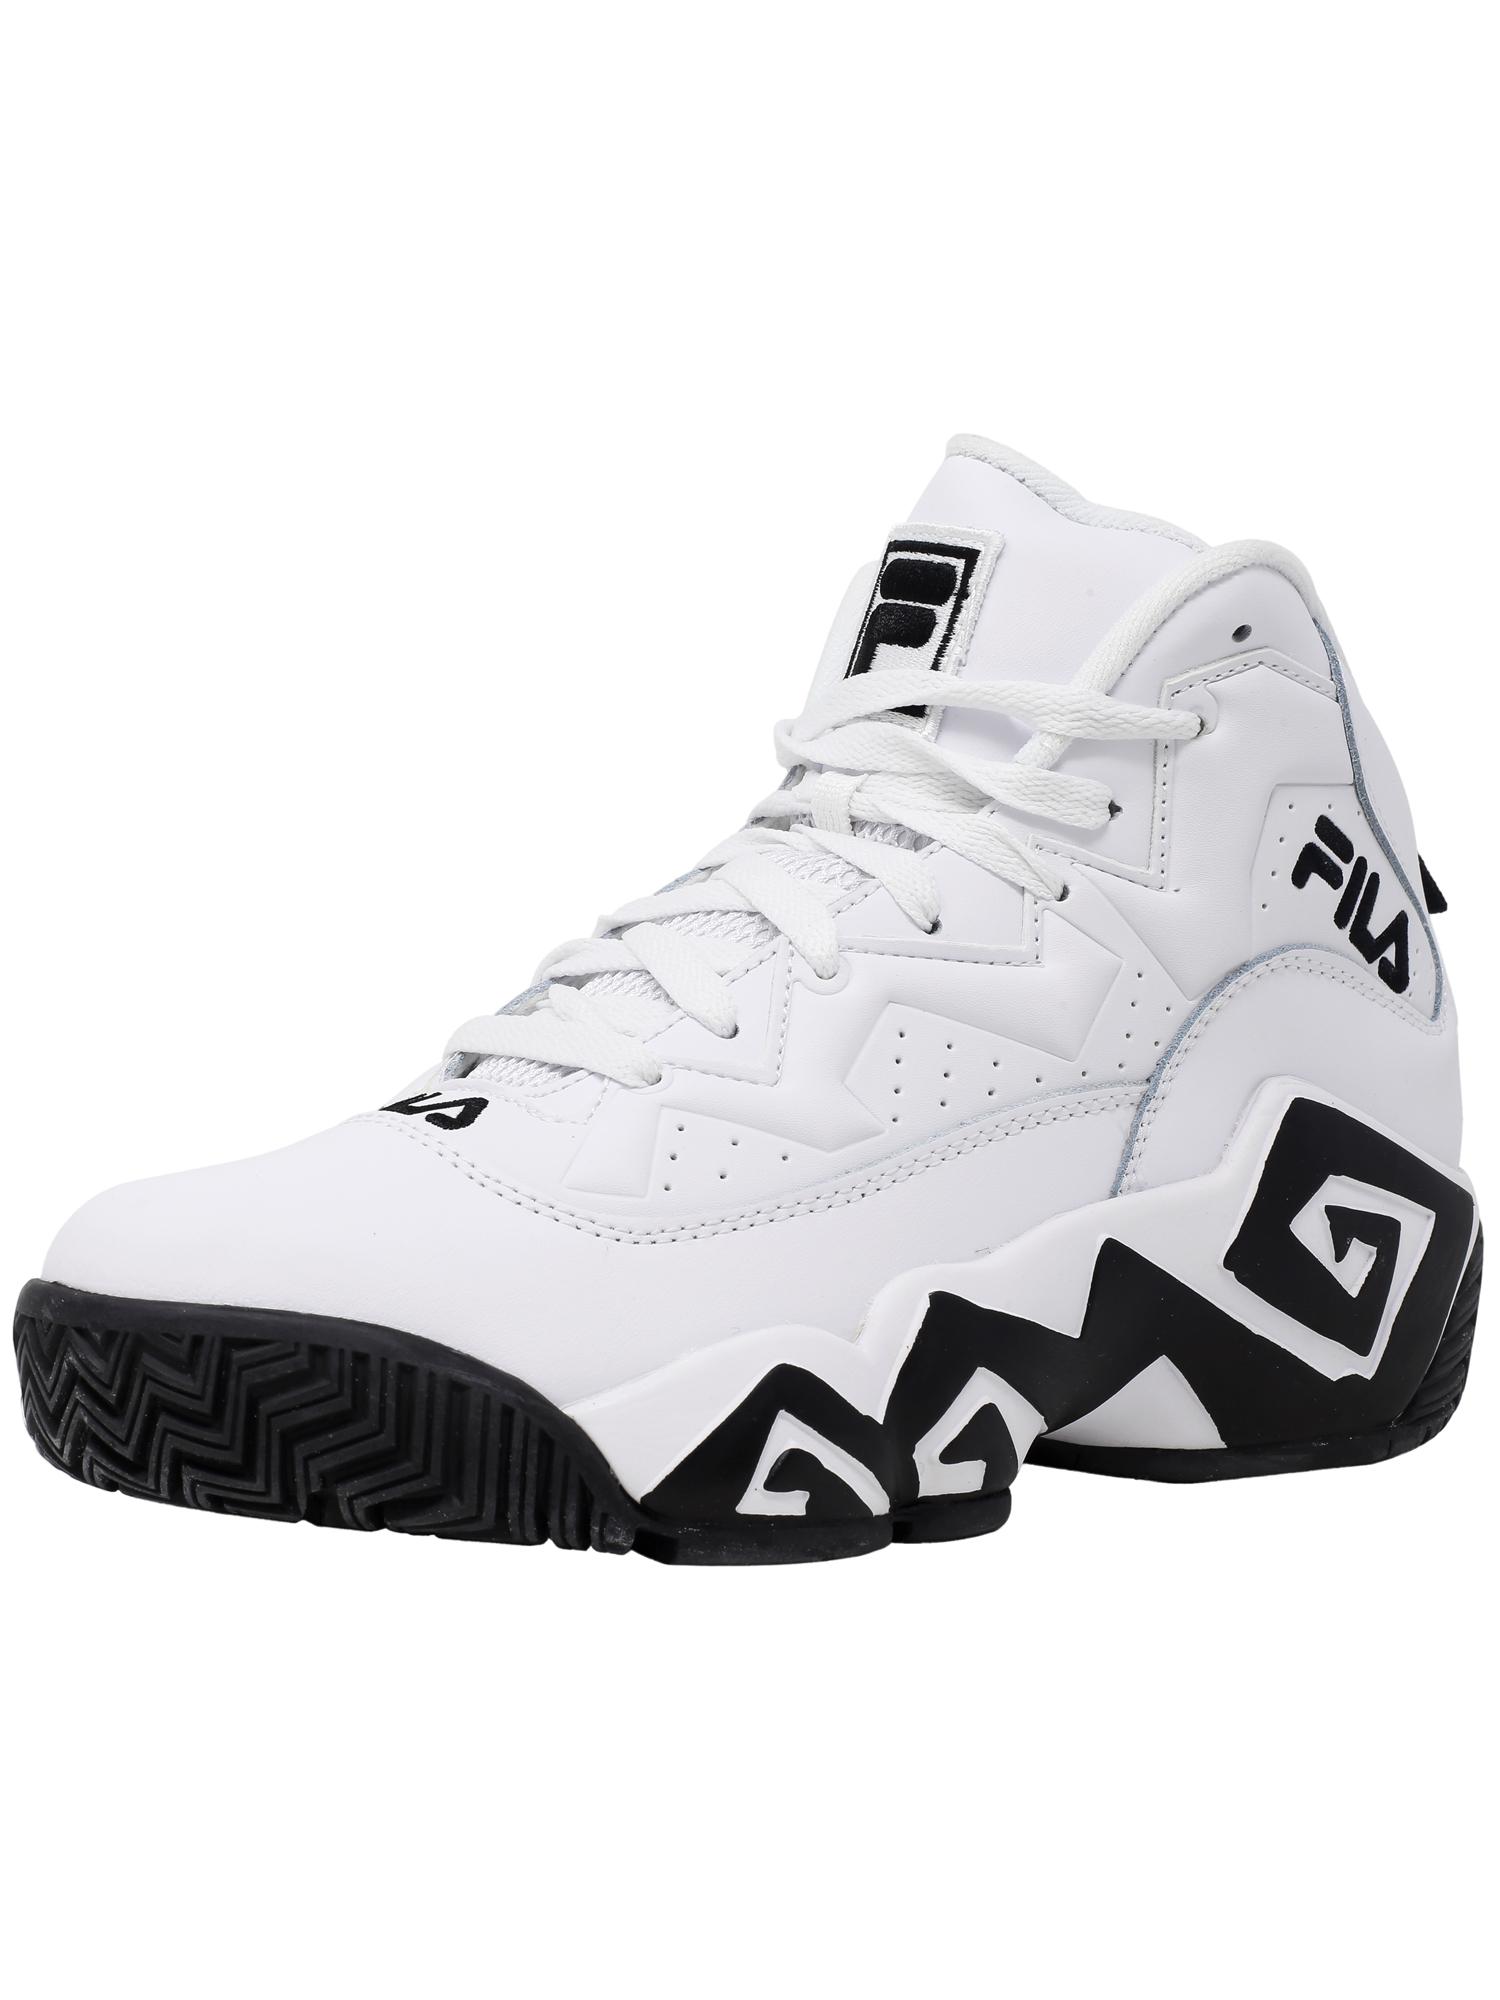 Fila Fila Men's Mb White Black High Top Basketball Shoe 9.5M